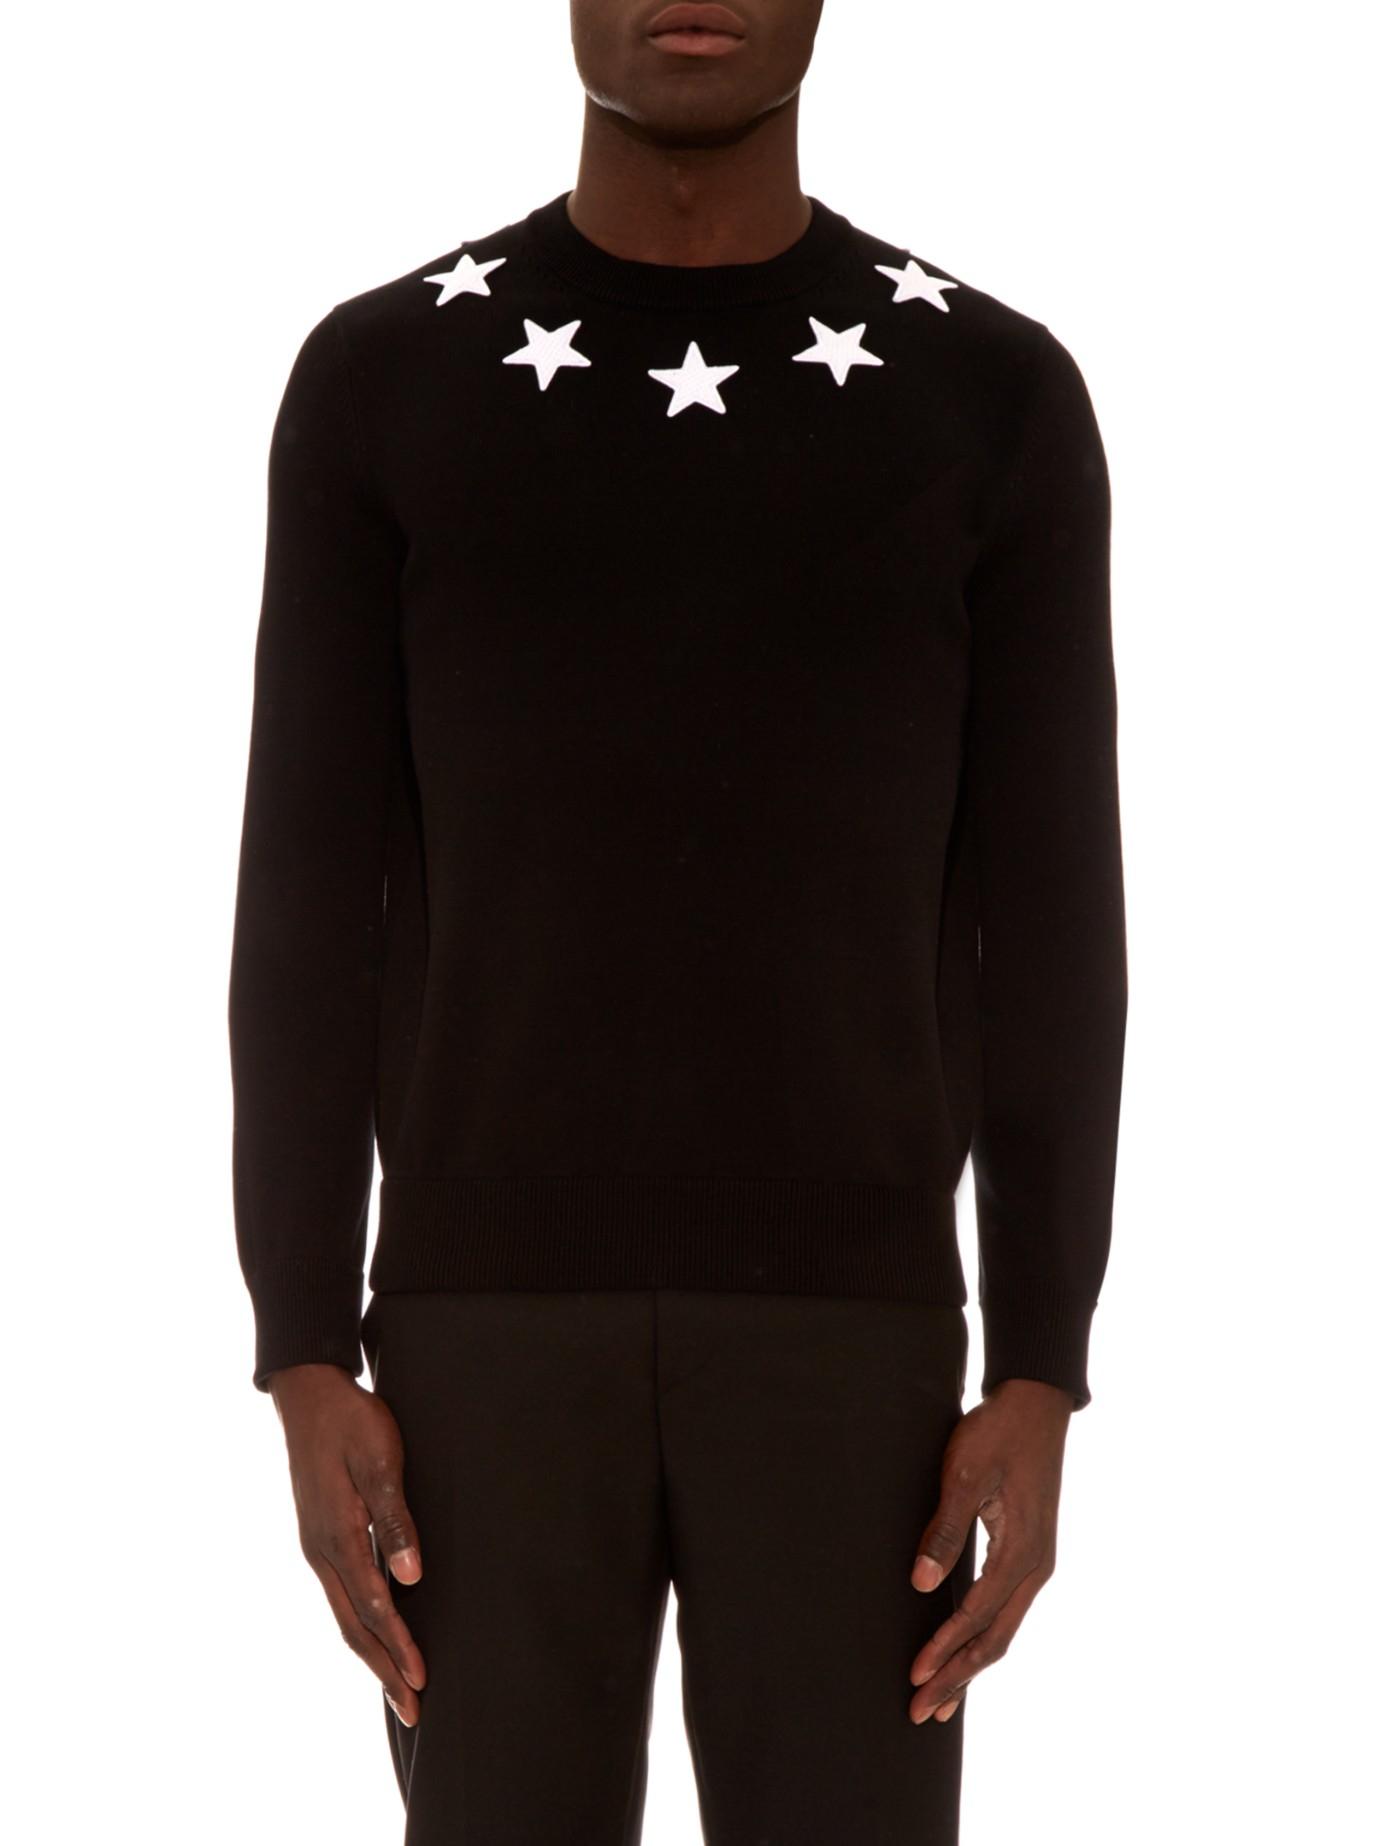 Hot Sale star applique sweatshirt - Black Givenchy Buy Cheap 2018 Best Seller Cheap Online Cheap Best vdpU7